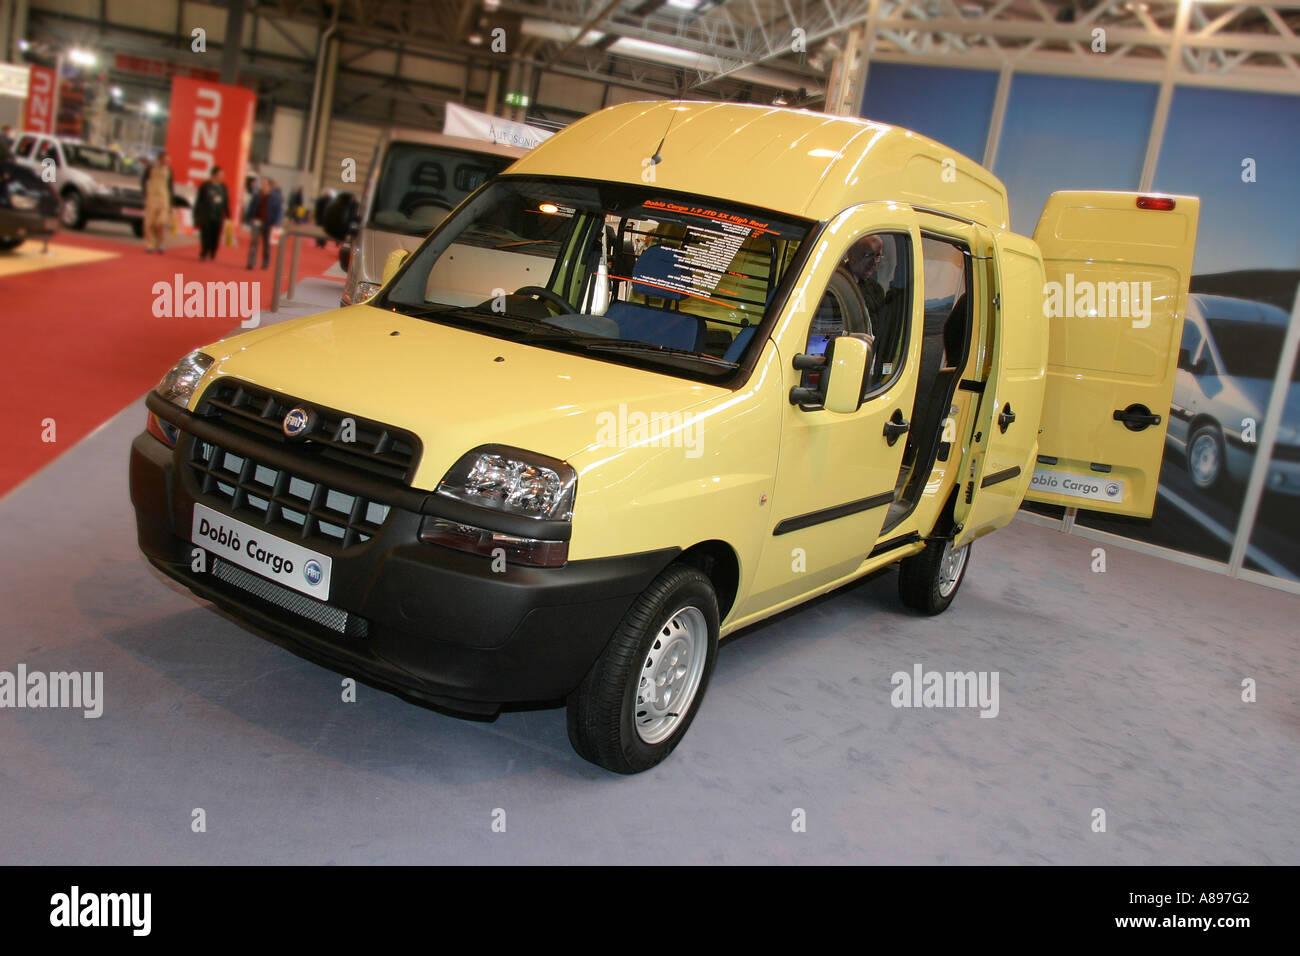 Fiat Doblo Cargo Van At The Commercial Vehicle Show Nec Birmingham